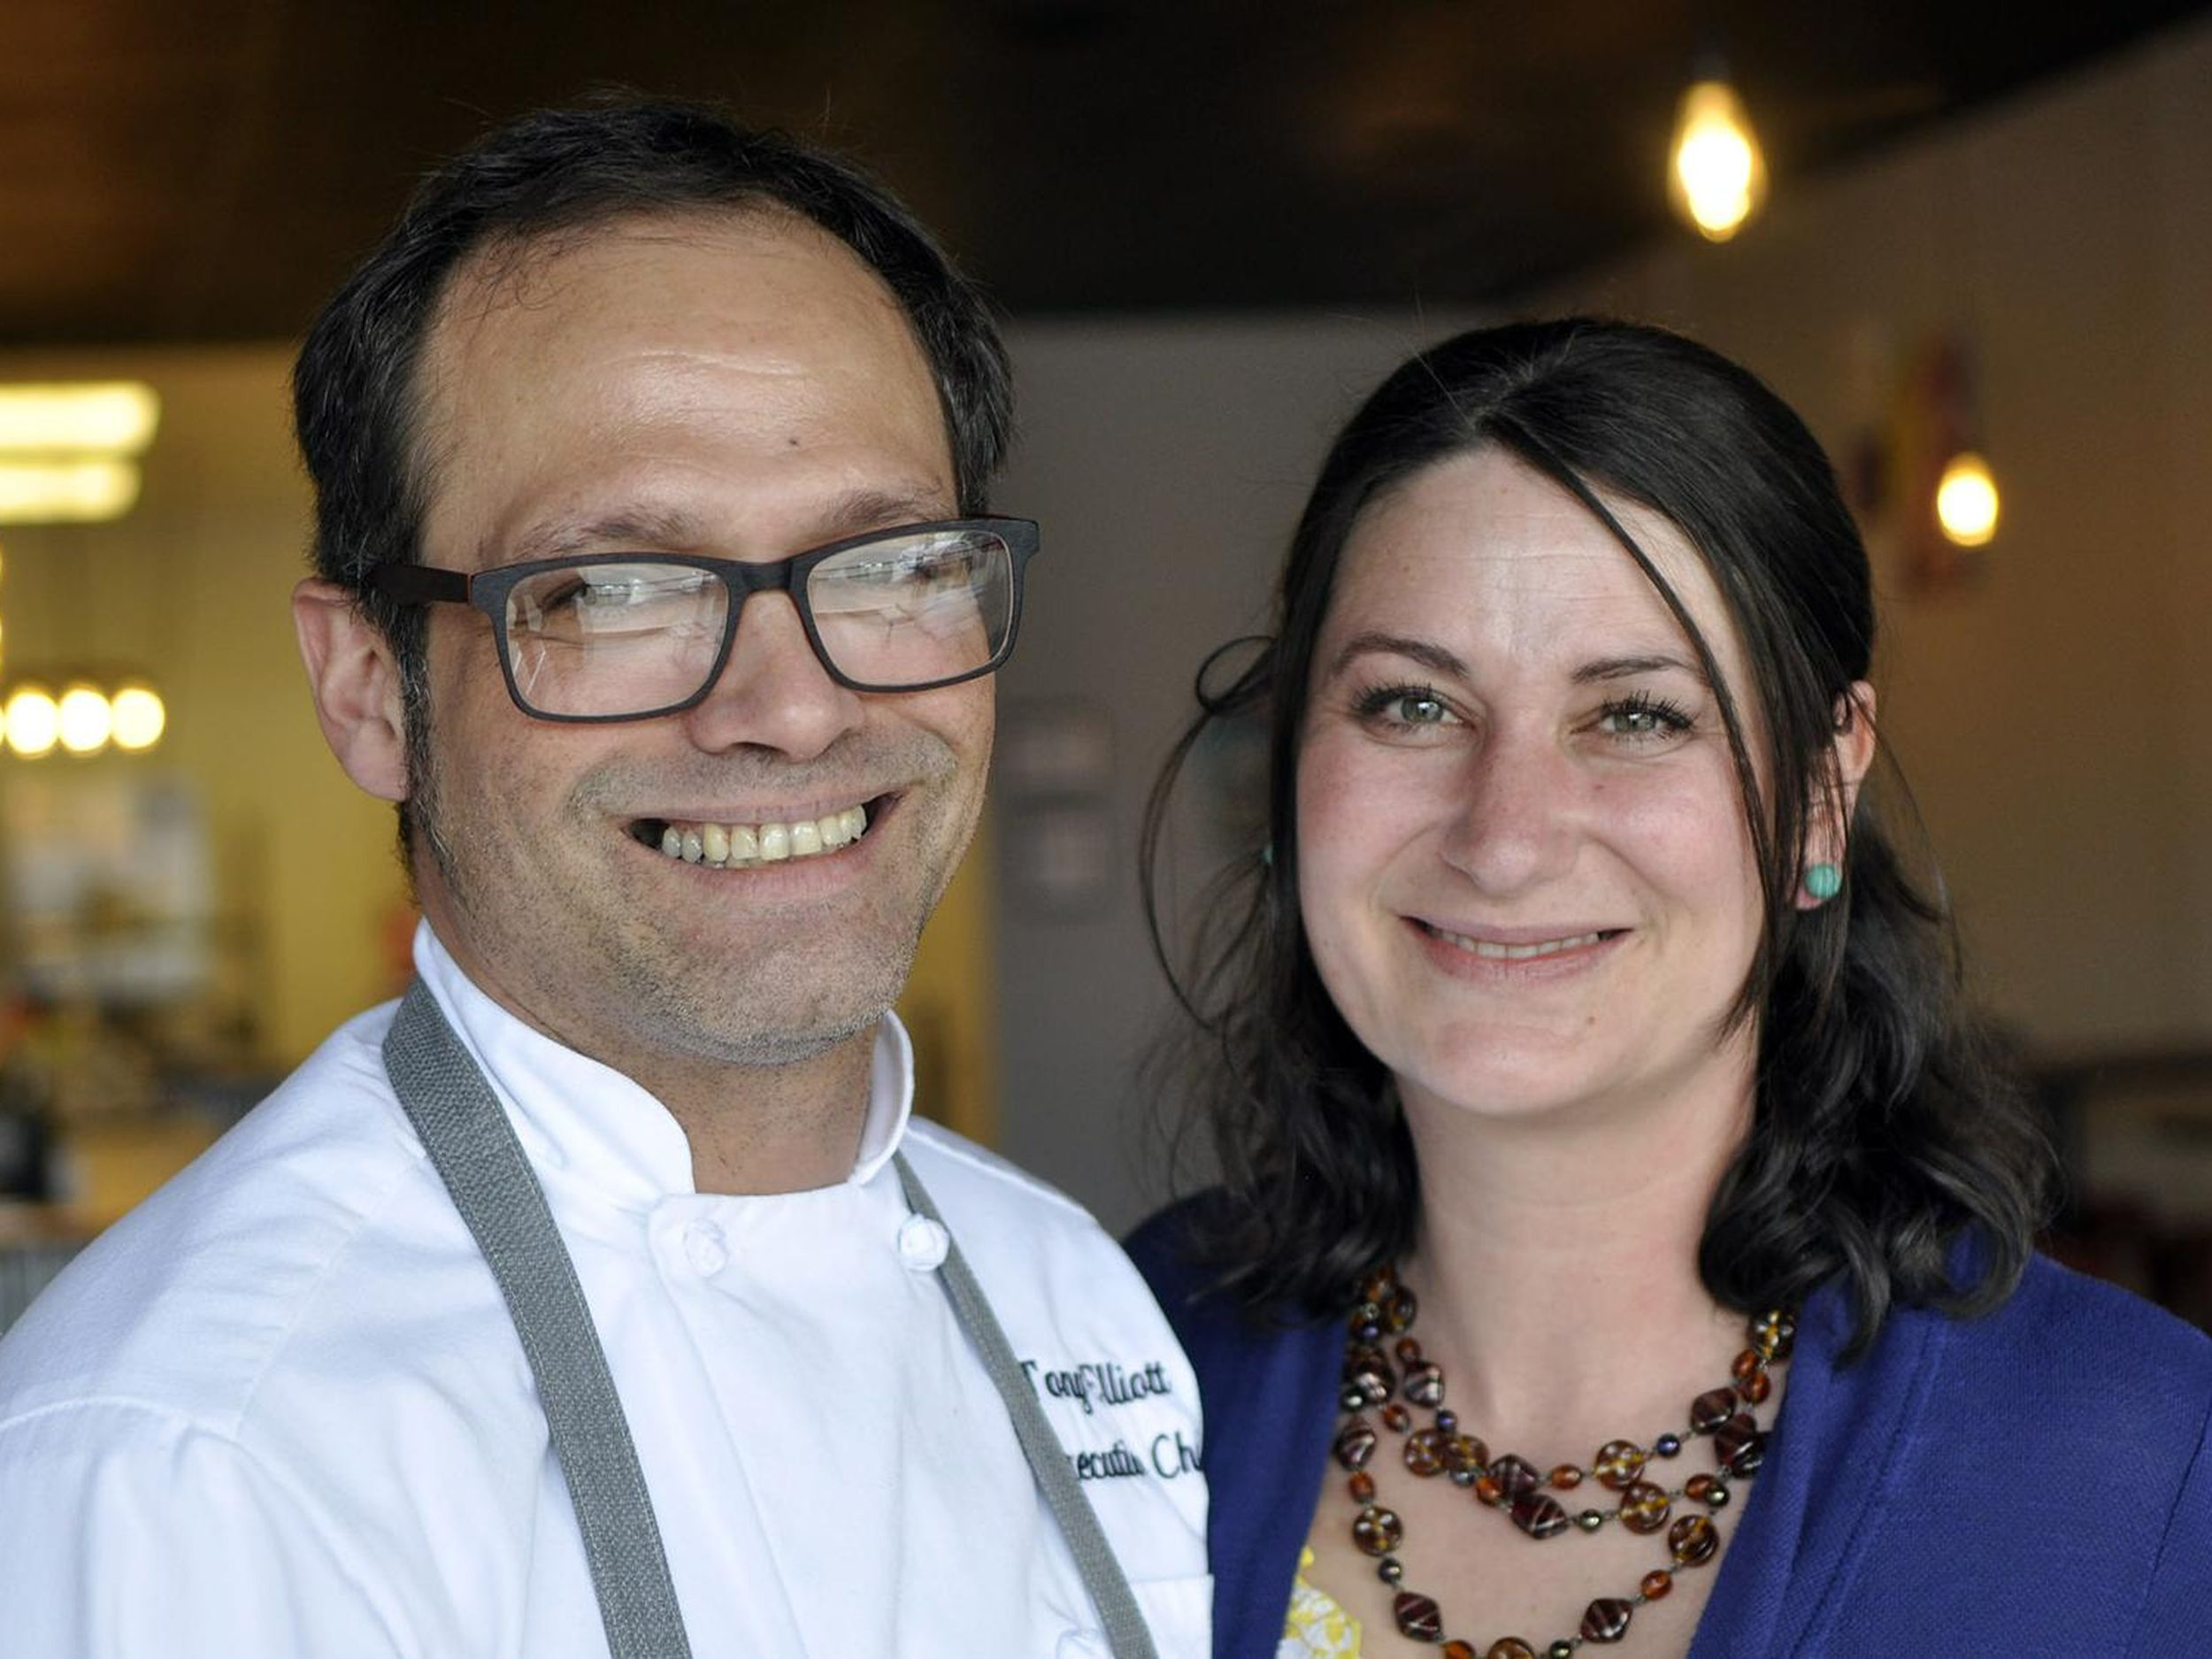 Elliotts An Urban Kitchen Offers Modern American Fare On North Monroe Street The Spokesman Review